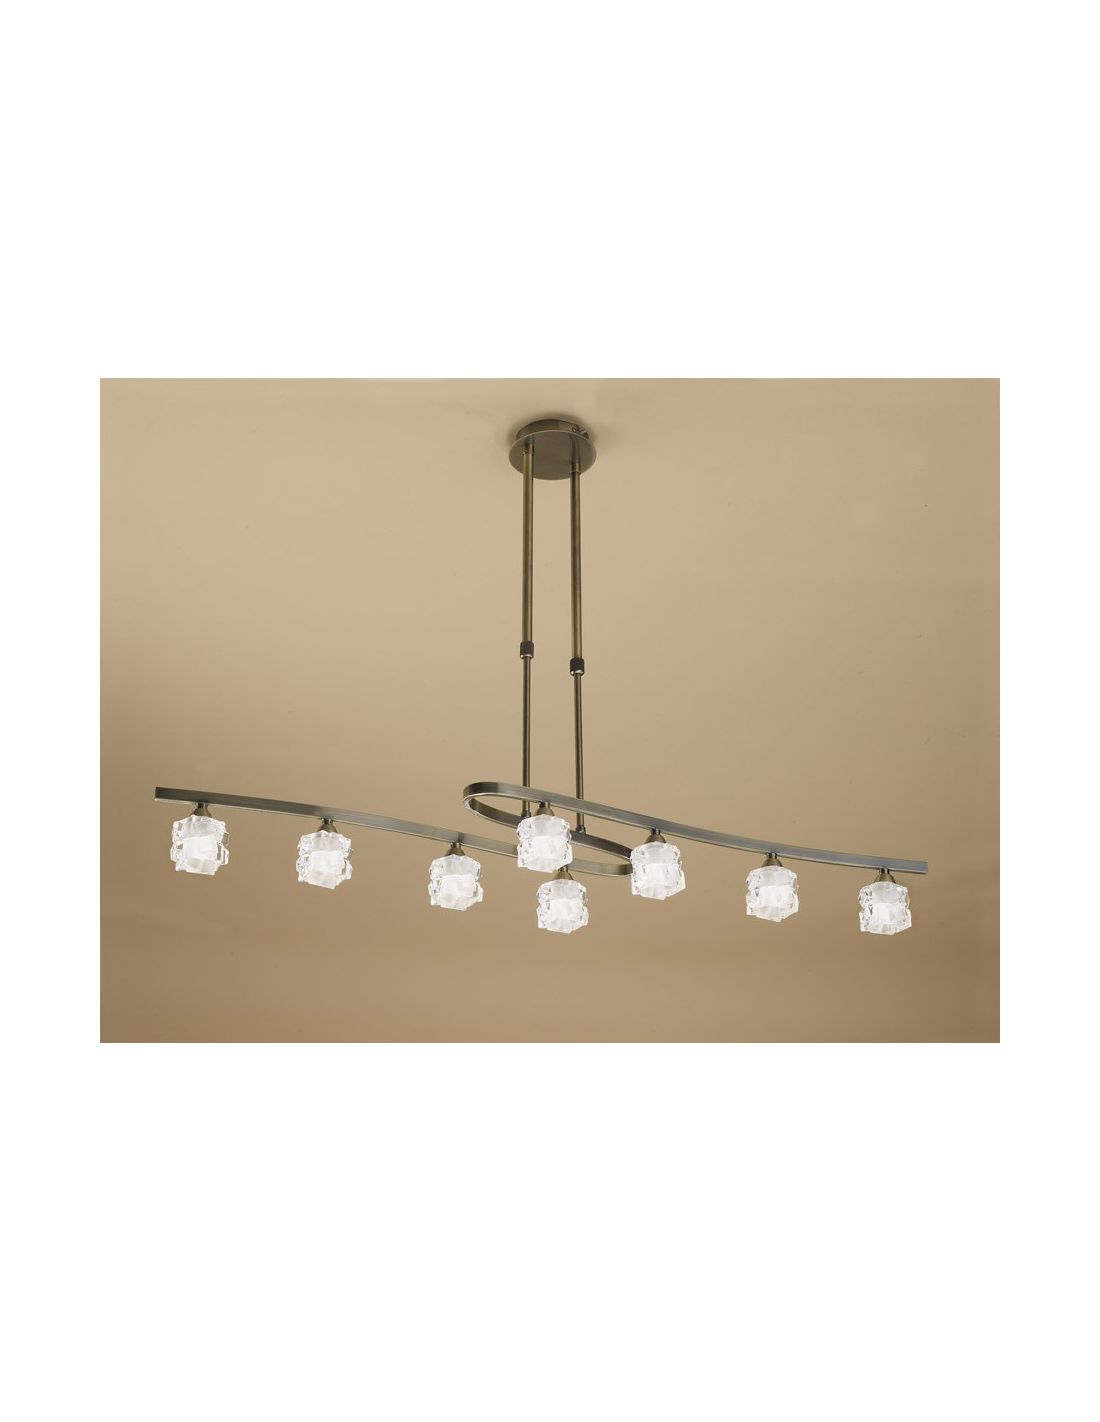 Lamparas mantra lamparas modernas baratas lamparas - Lamparas modernas para dormitorio ...